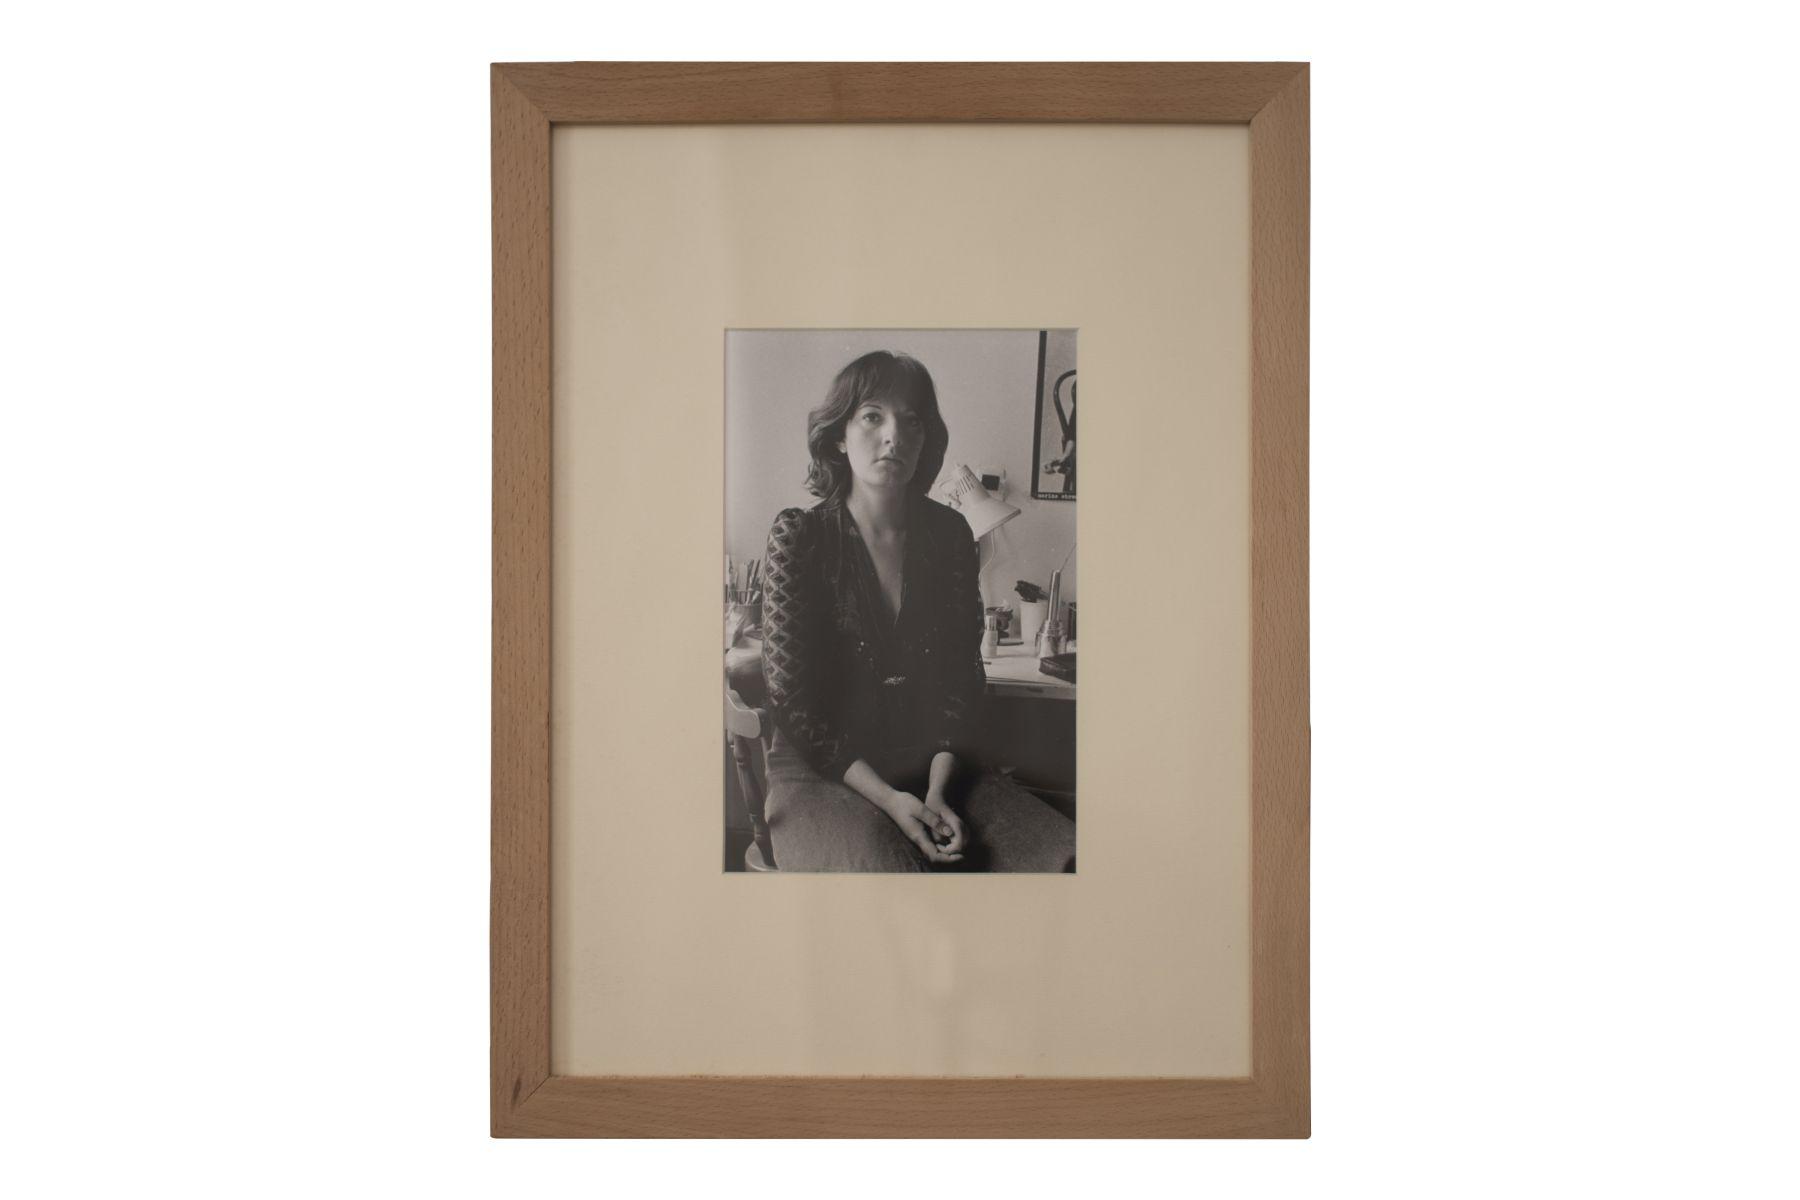 #150 Milan Jozic, Portrait of Marina Abramovic, Photo | Milan Jozic, Porträt von Marina Abramovic, Foto Image